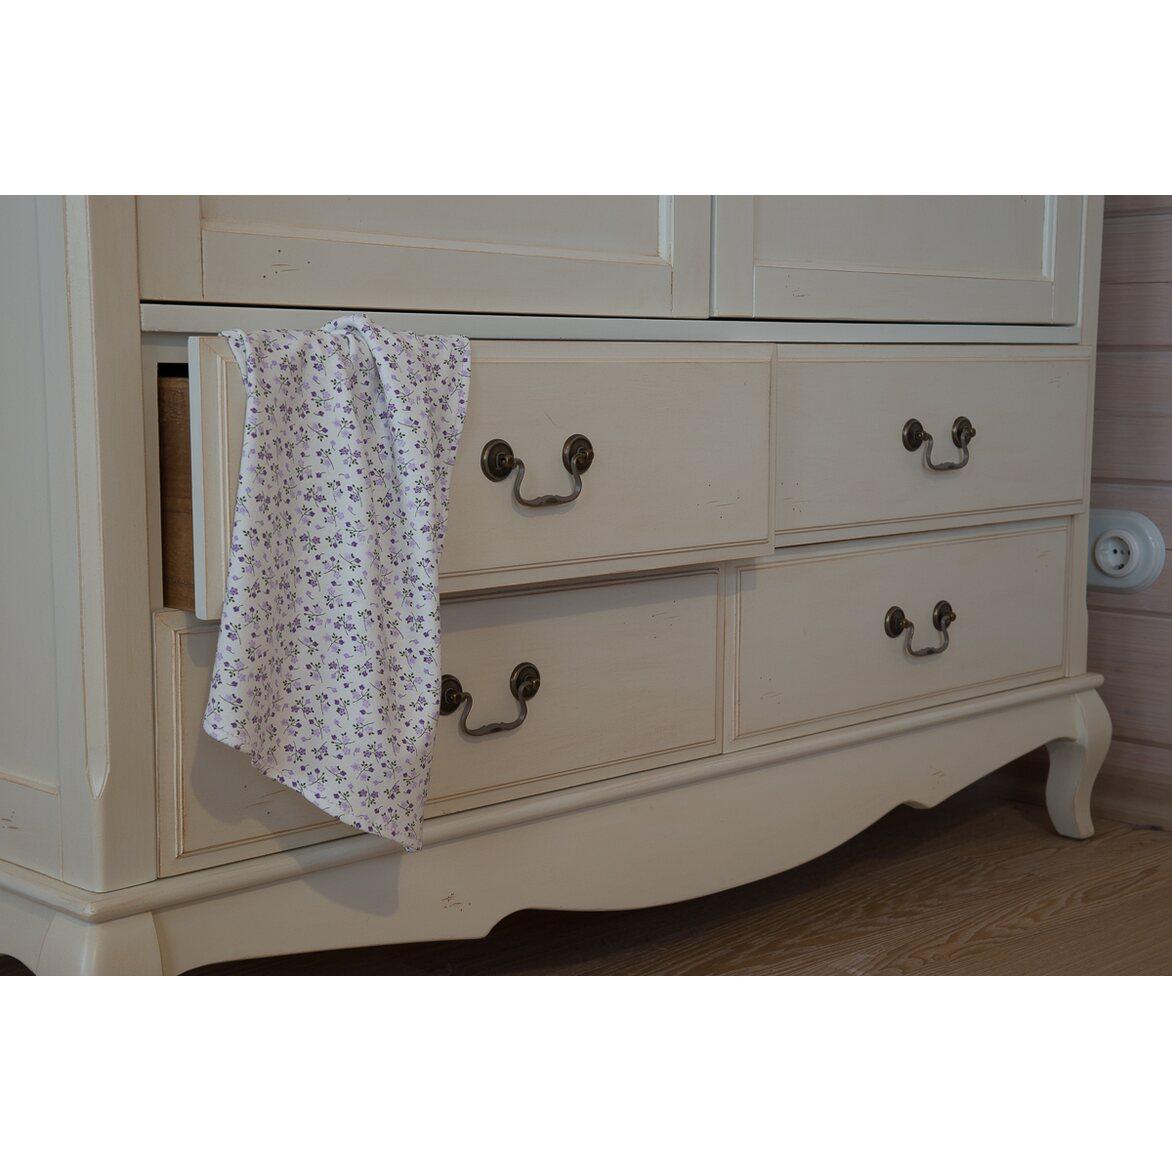 Шкаф двухстворчатый с 4-я ящиками Leontina, бежевого цвета 5 | Платяные шкафы Kingsby